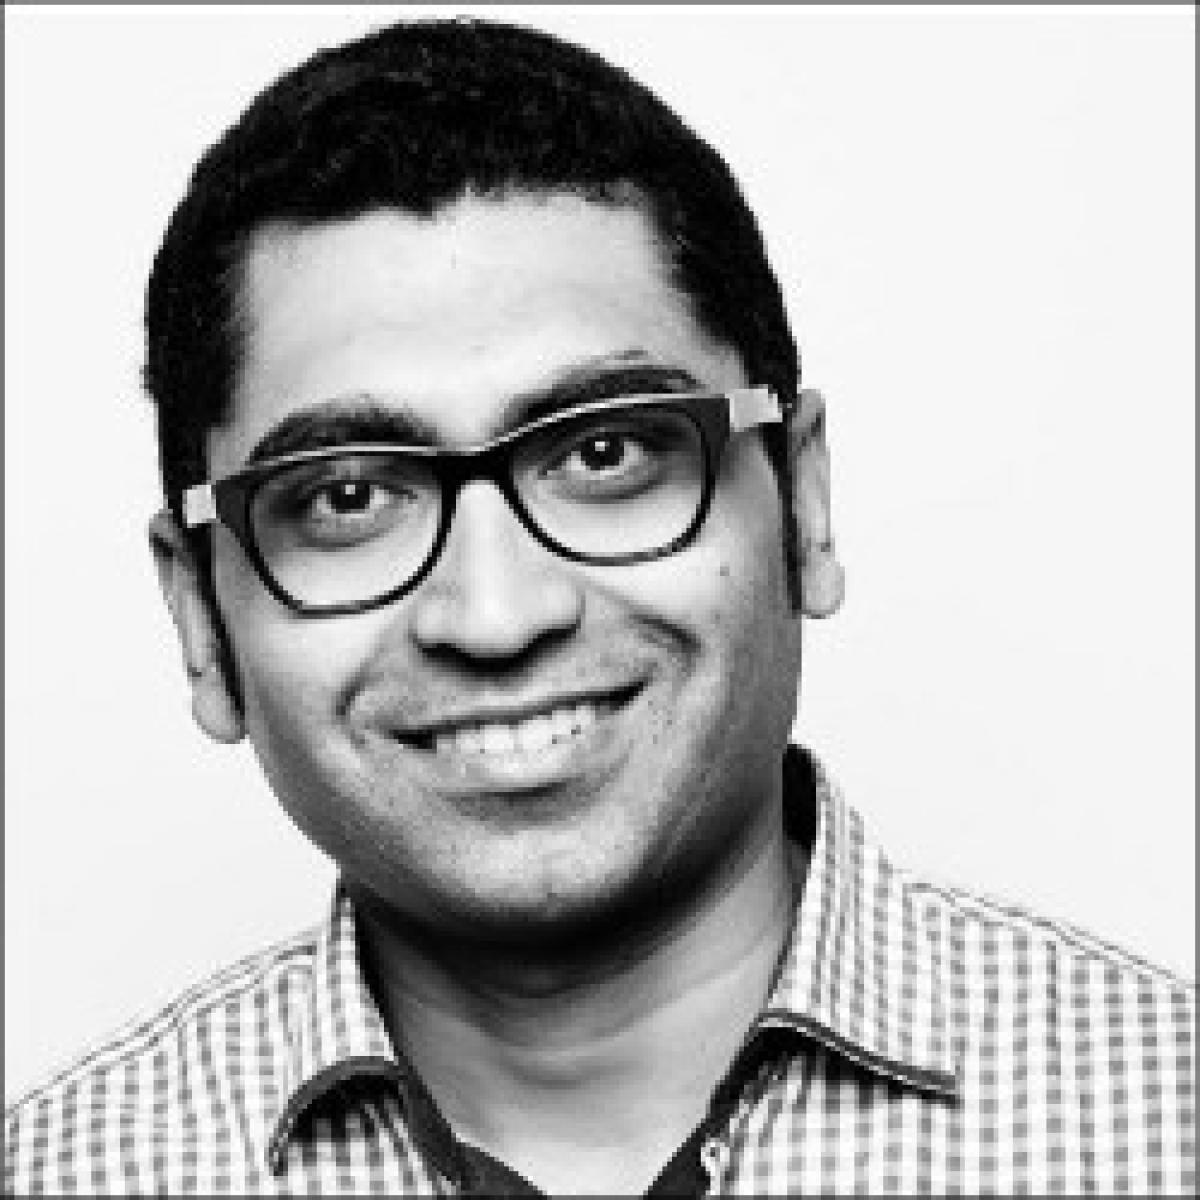 Facebook elevates Saurabh Doshi to a new role